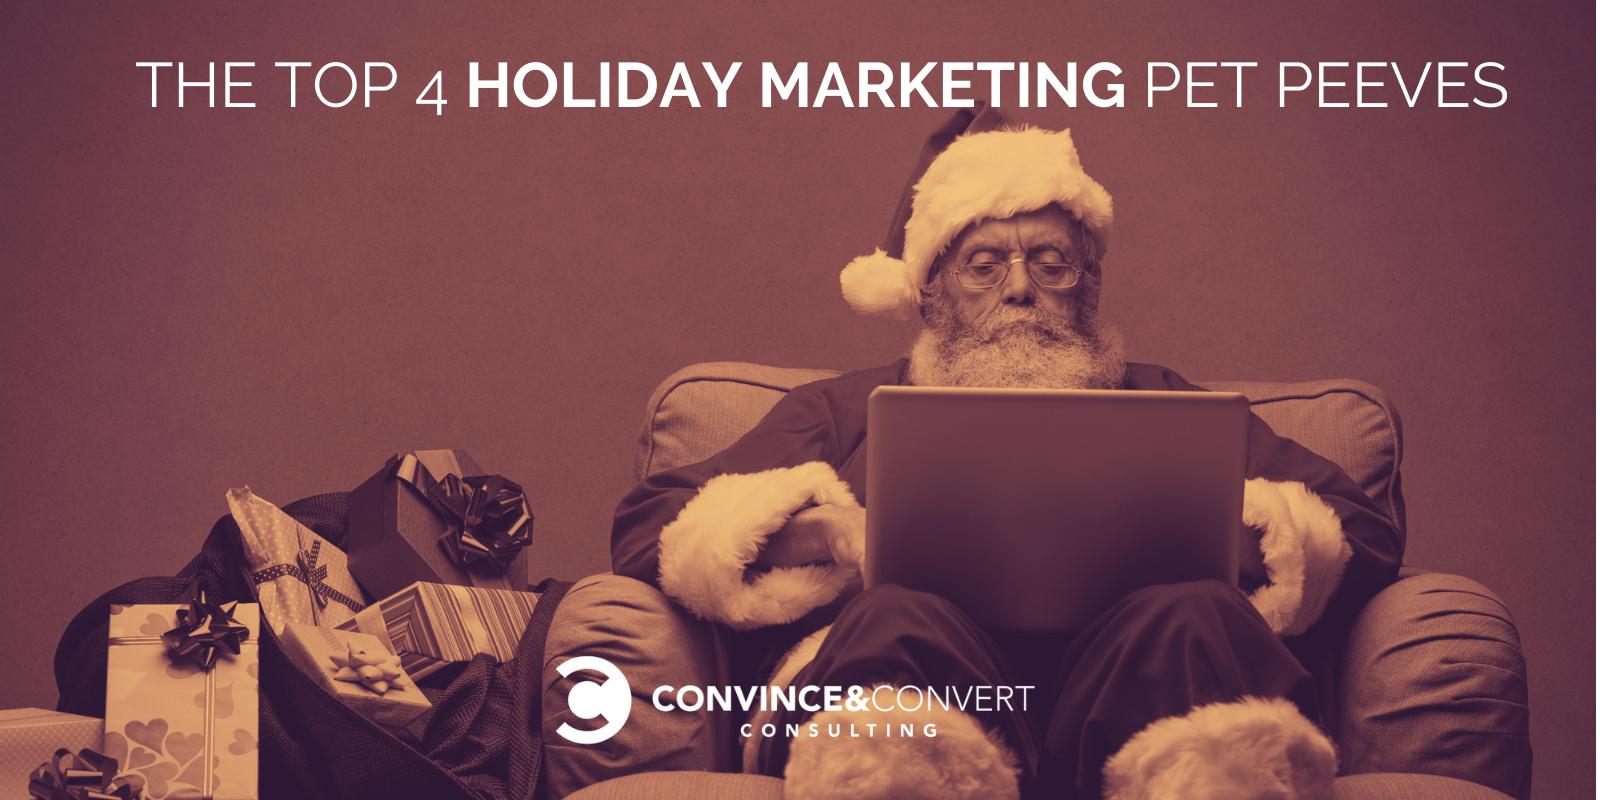 Holiday Marketing Pet Peeves